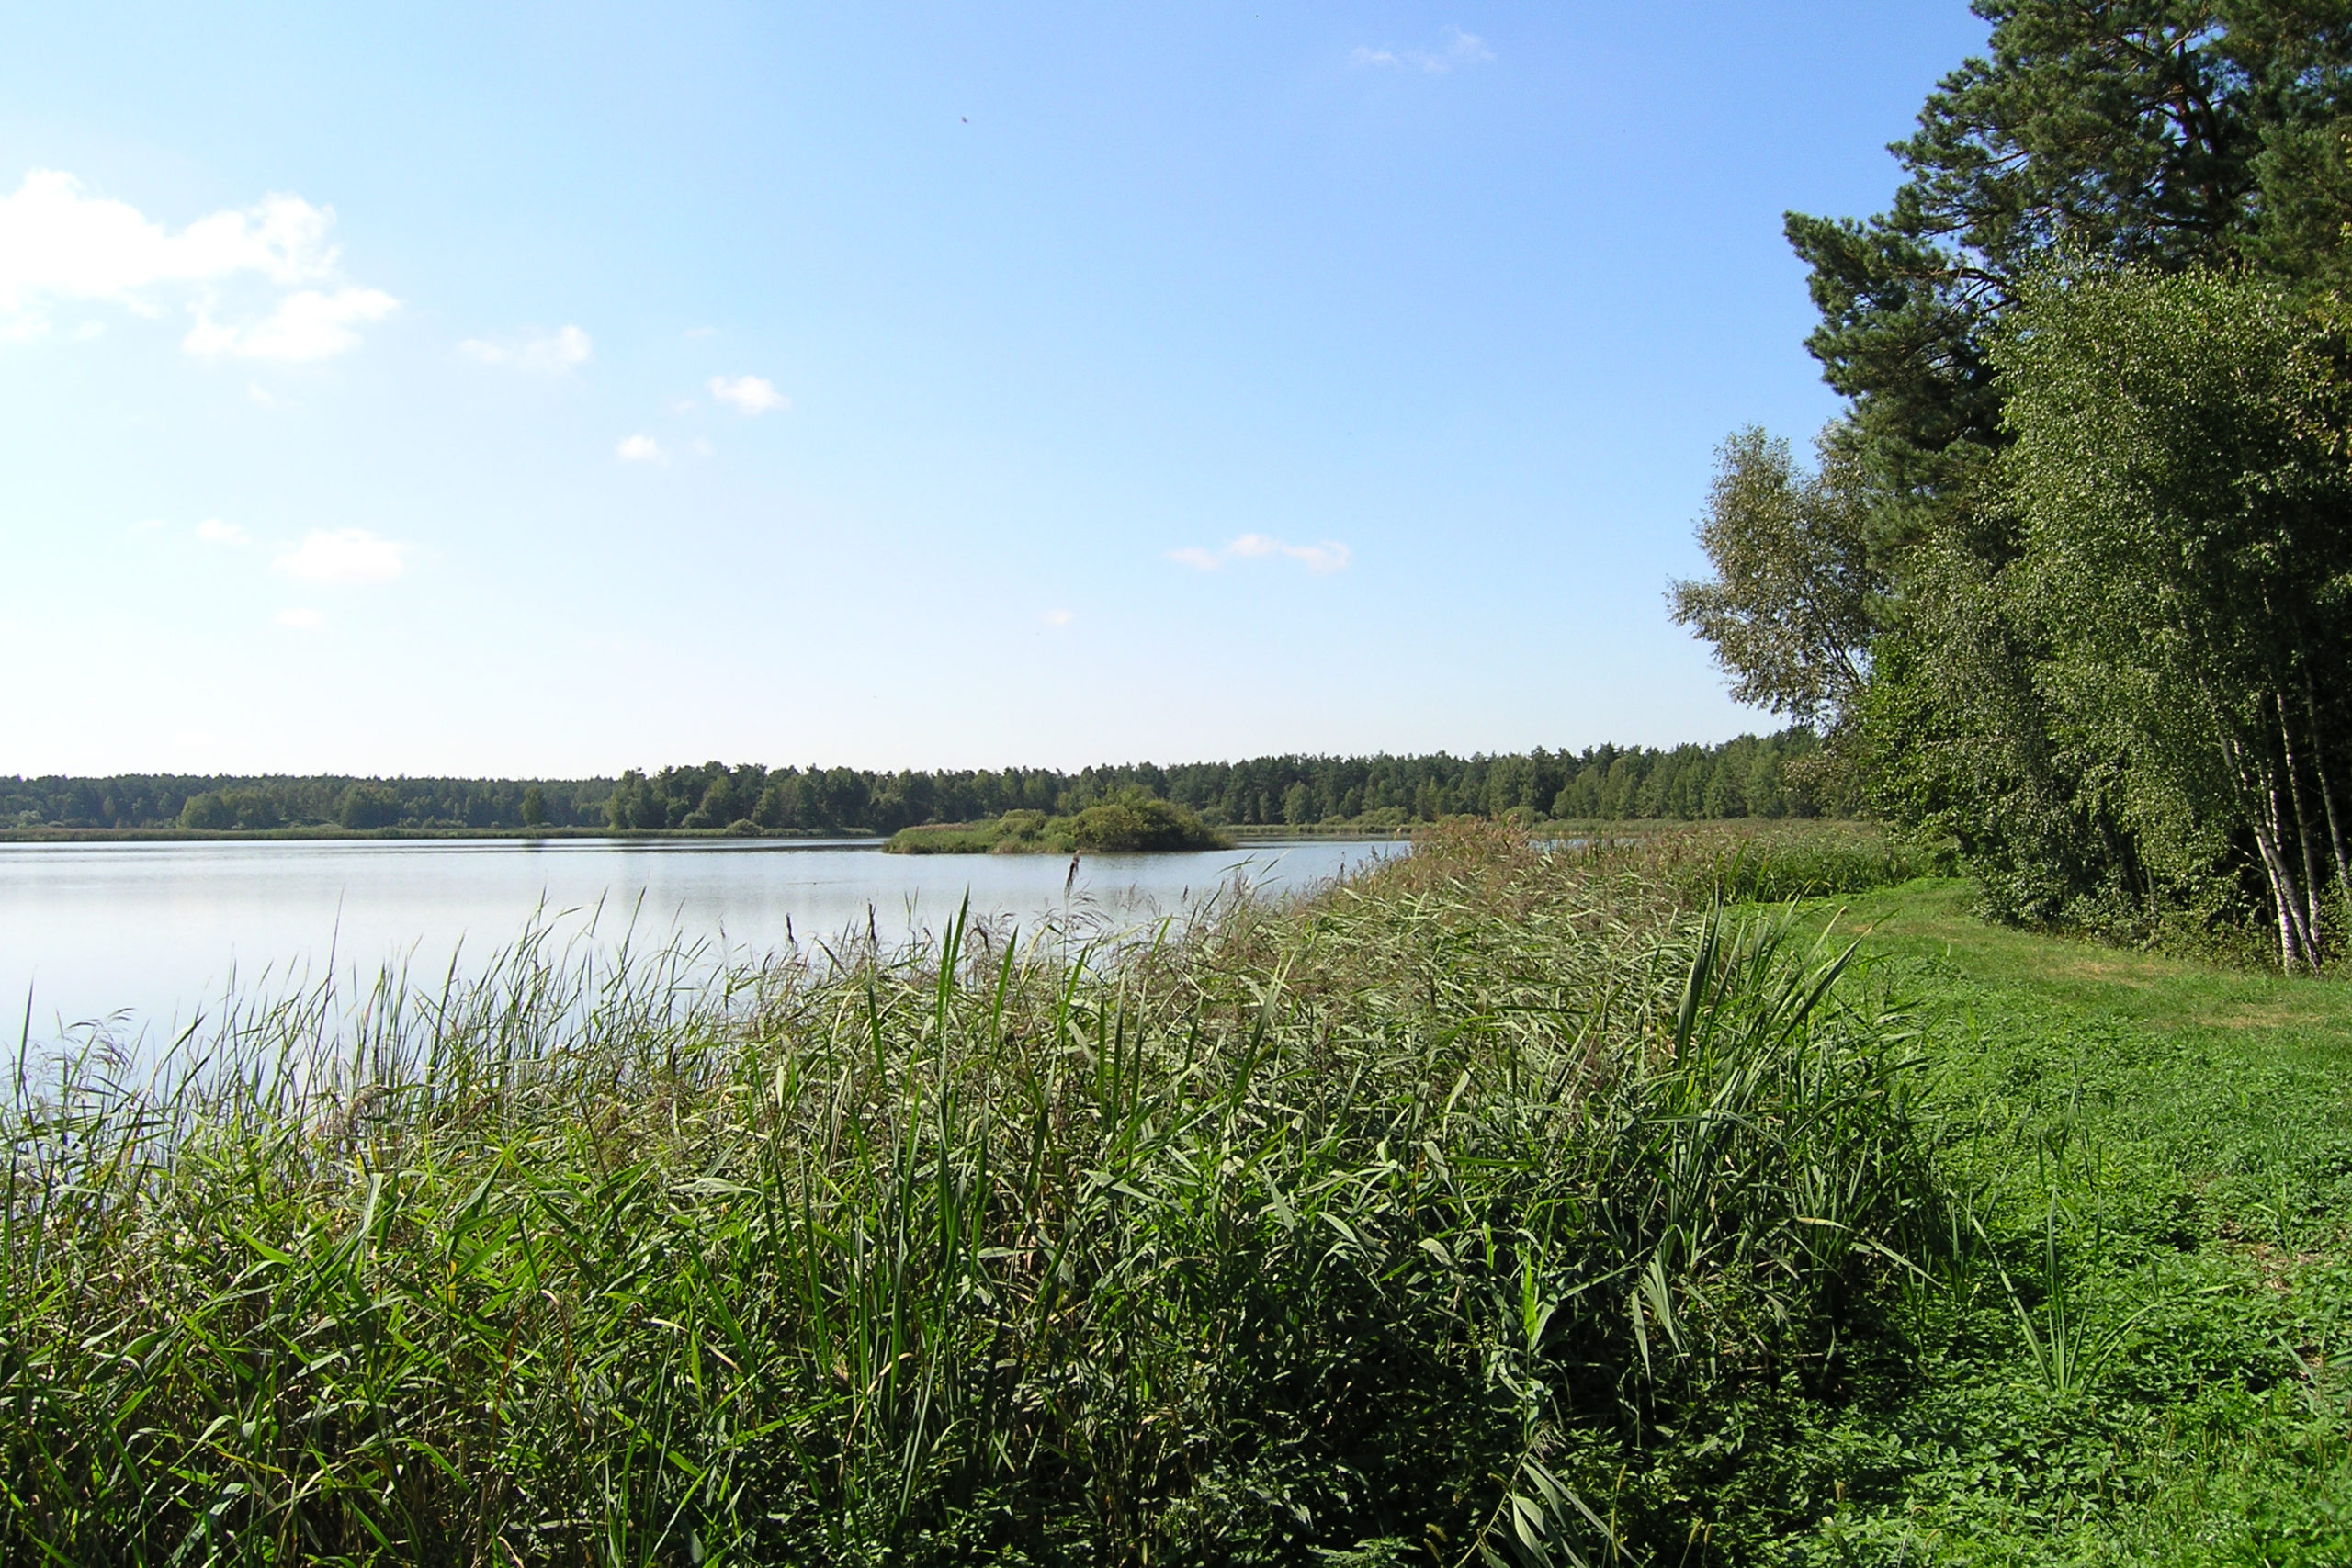 okuninka widok na jezioro